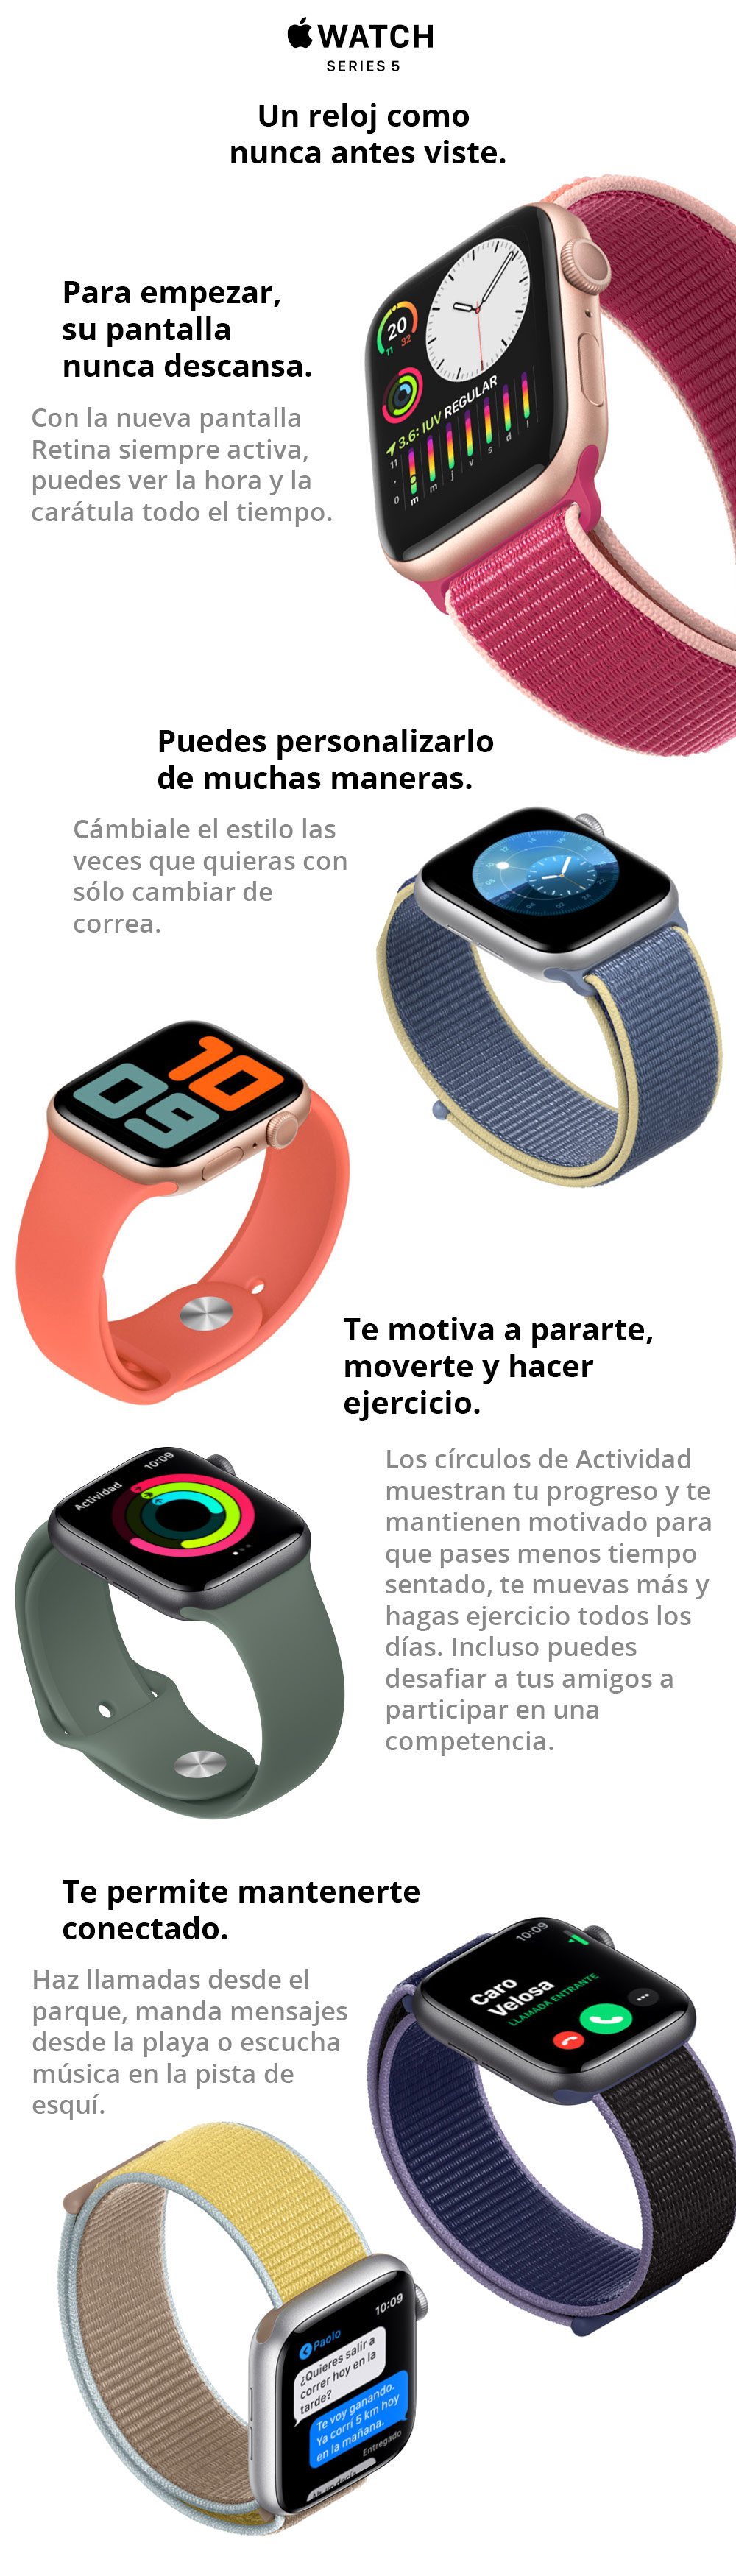 Apple Watch - Series 5 Banner - LaTiendaPE